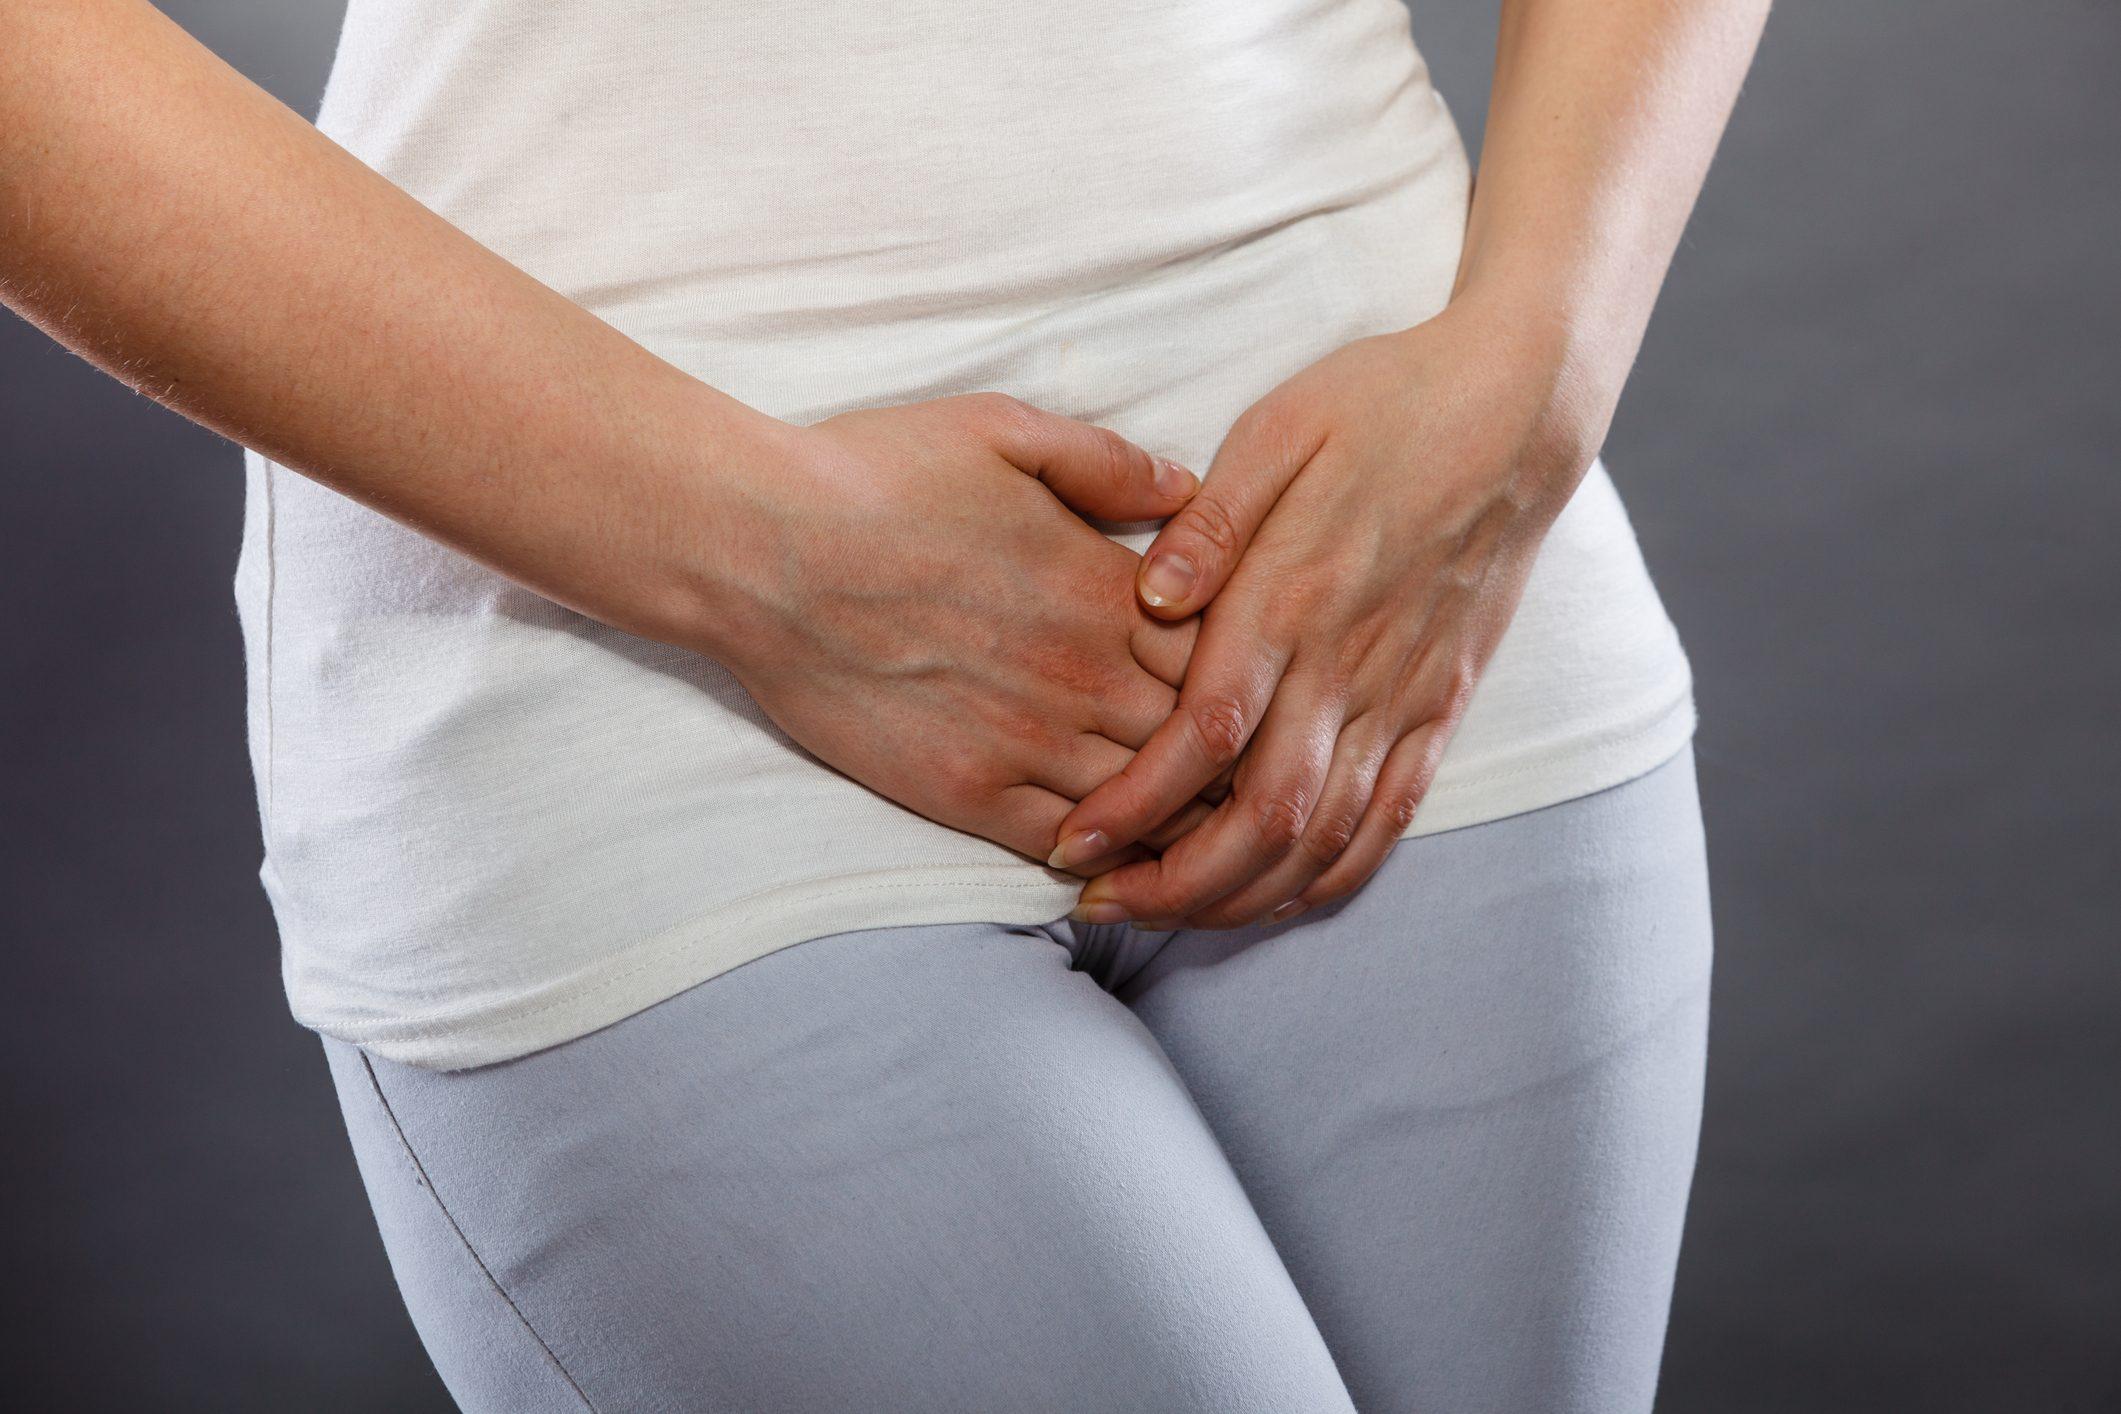 dolore alle vie urinarie uomo